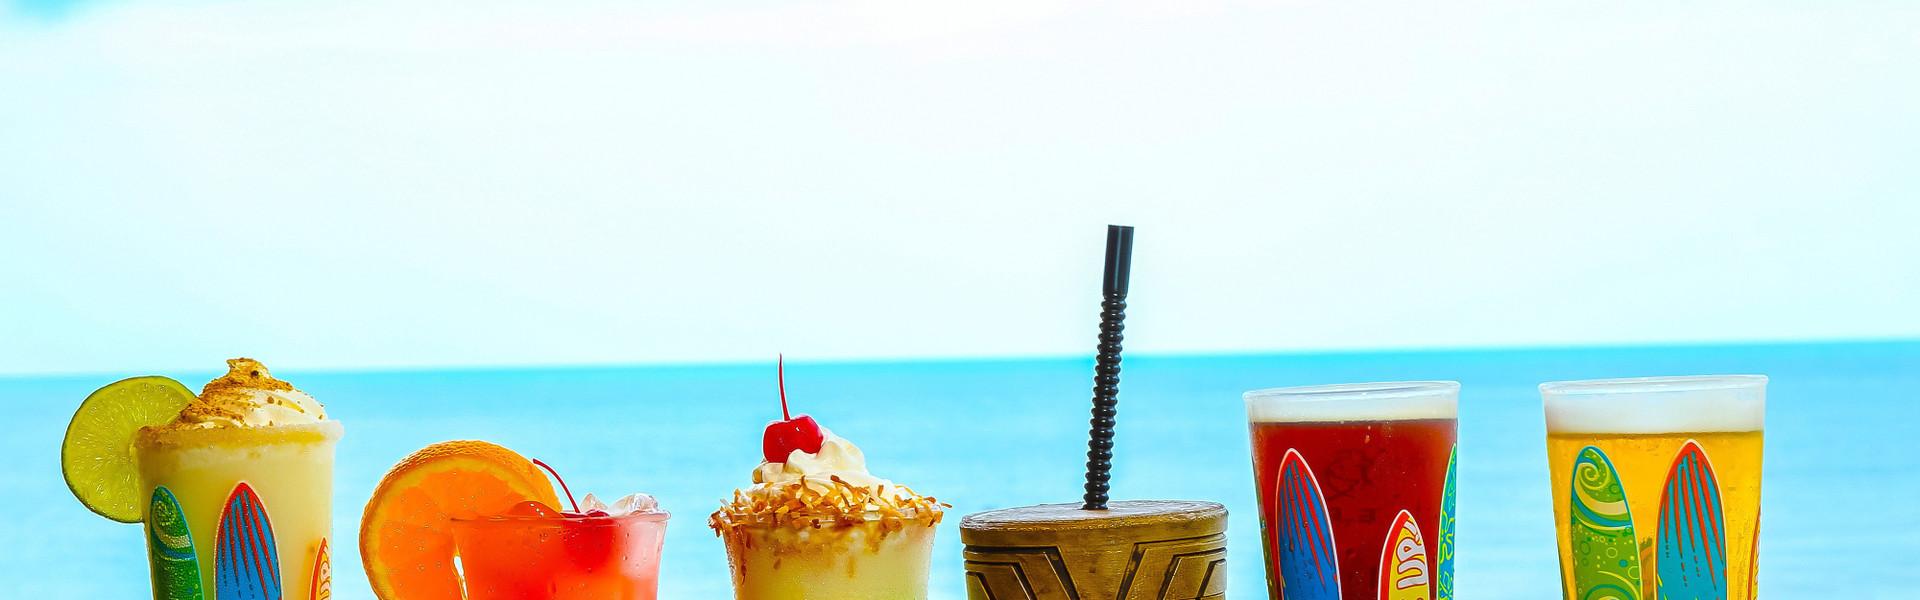 Restaurant on the Beach at our Cocoa Beach Hotel near Westgate Cocoa Beach Pier   Drinks on the Beach